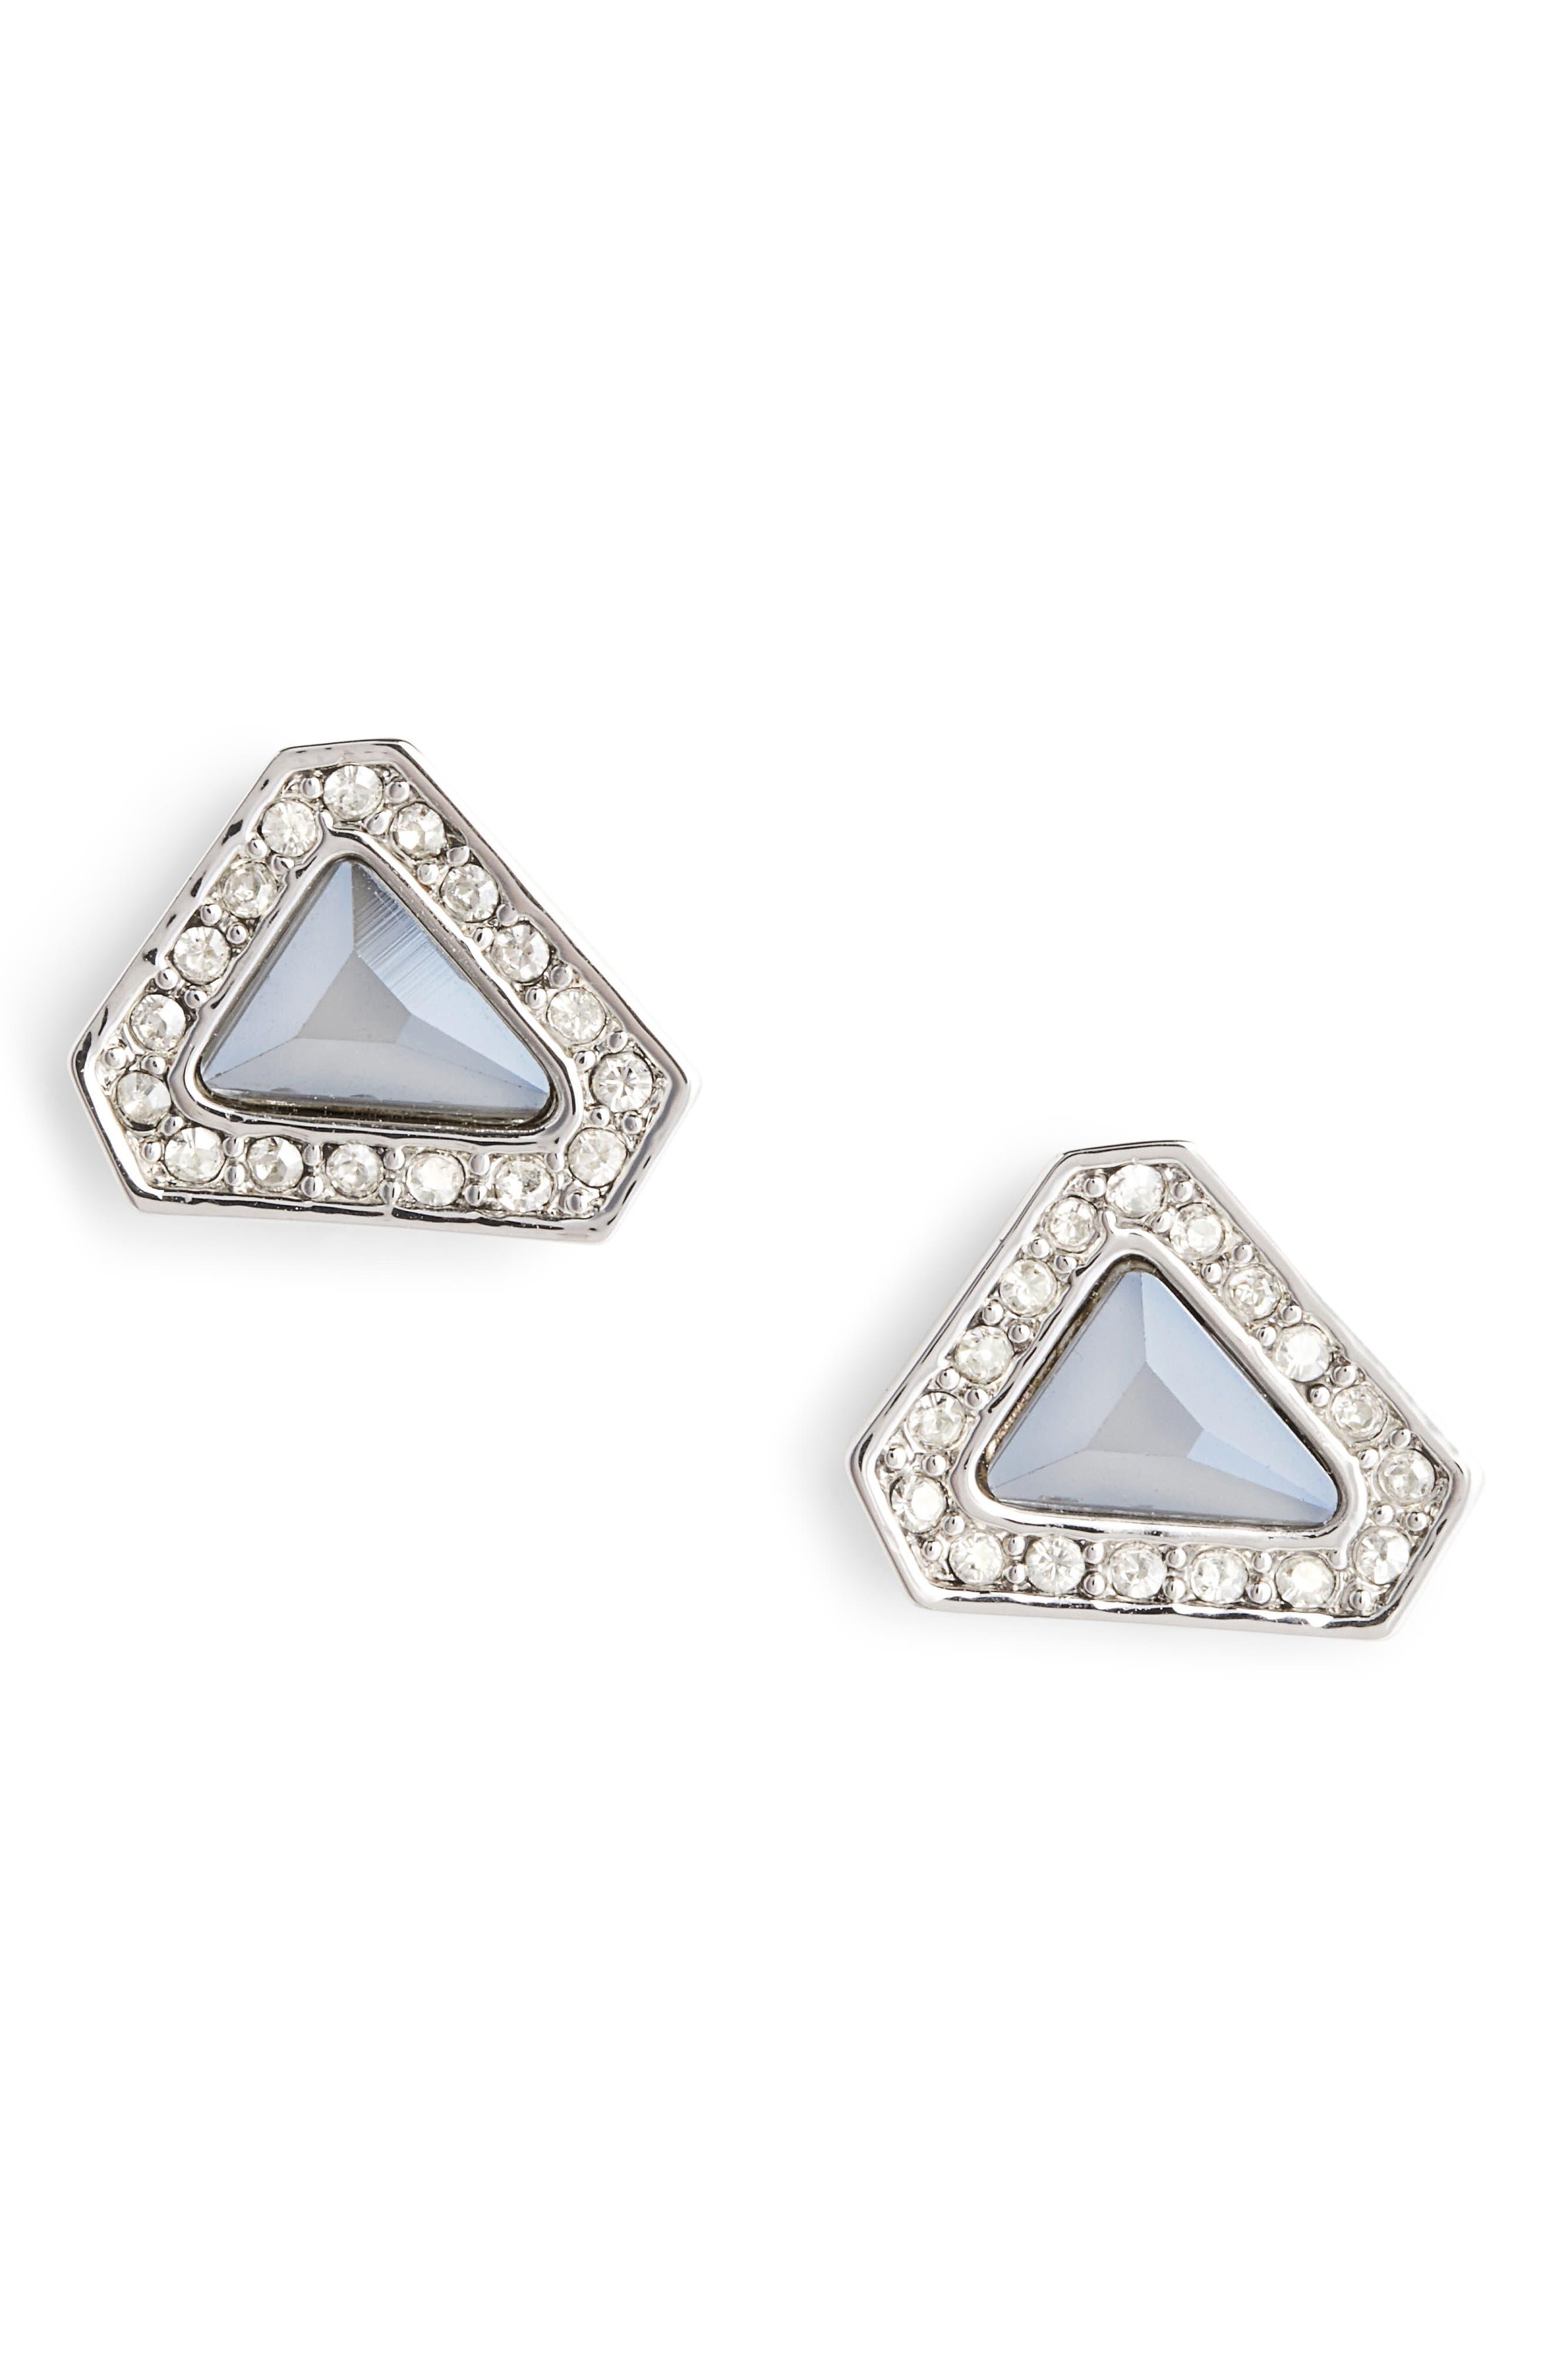 Swarovski Crystal Stud Earrings,                         Main,                         color, 020